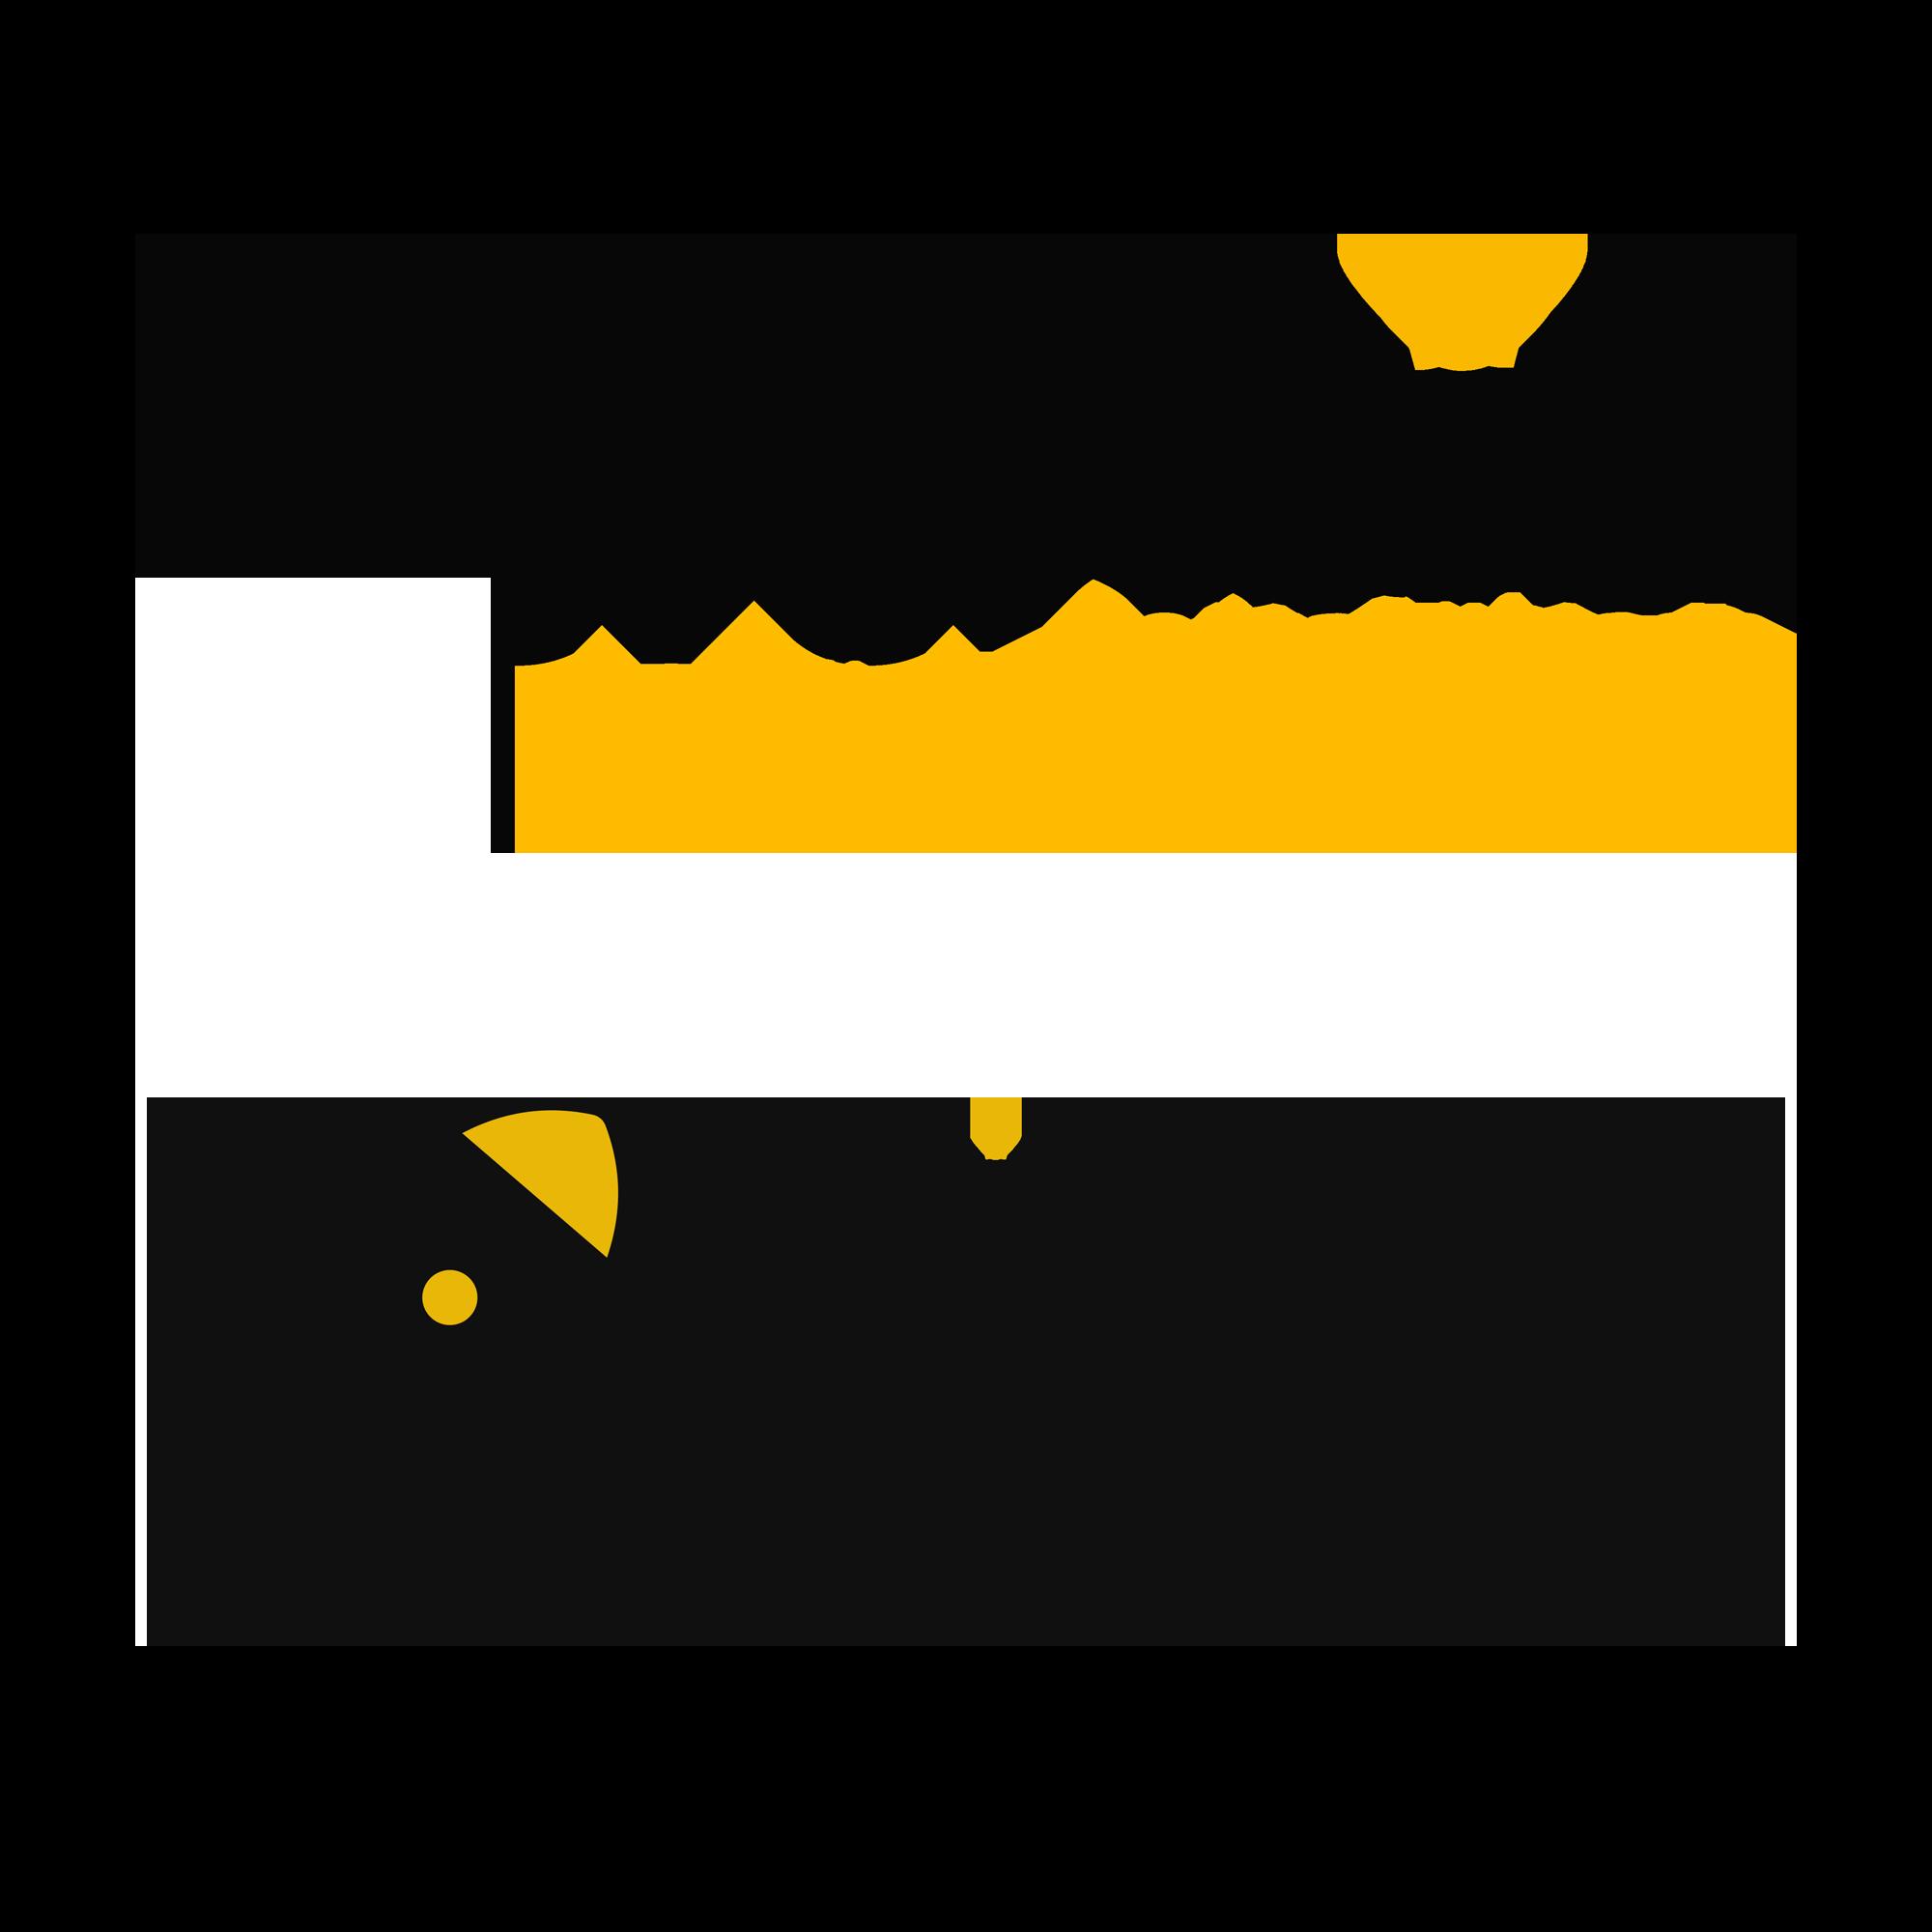 BATE PAPO ONLINE  GERENCIAL | COMECE